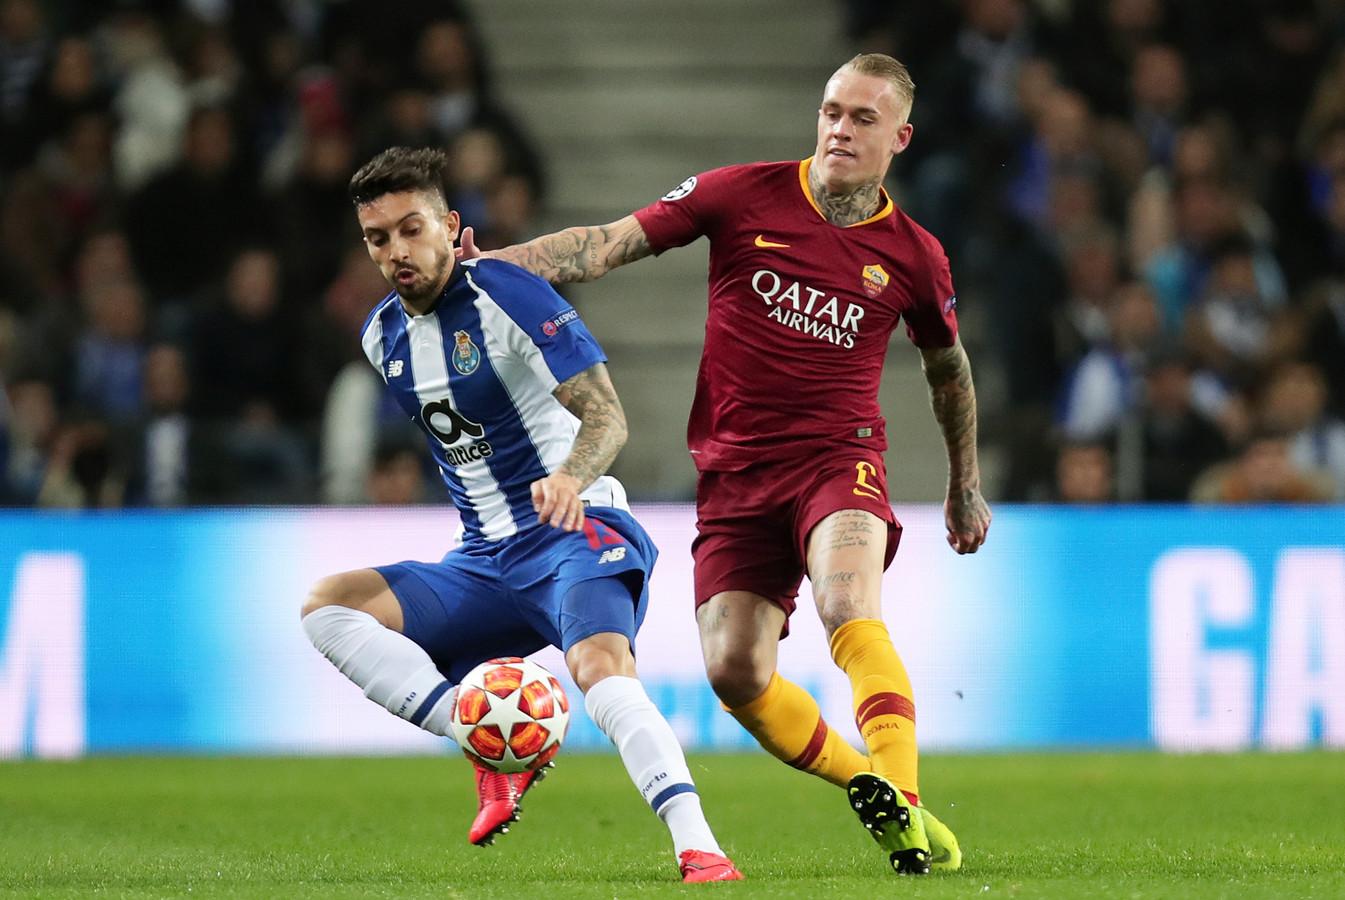 Rick Karsdorp in actie namens AS Roma tegen FC Porto in de achtste finales van de Champions League vorig seizoen.